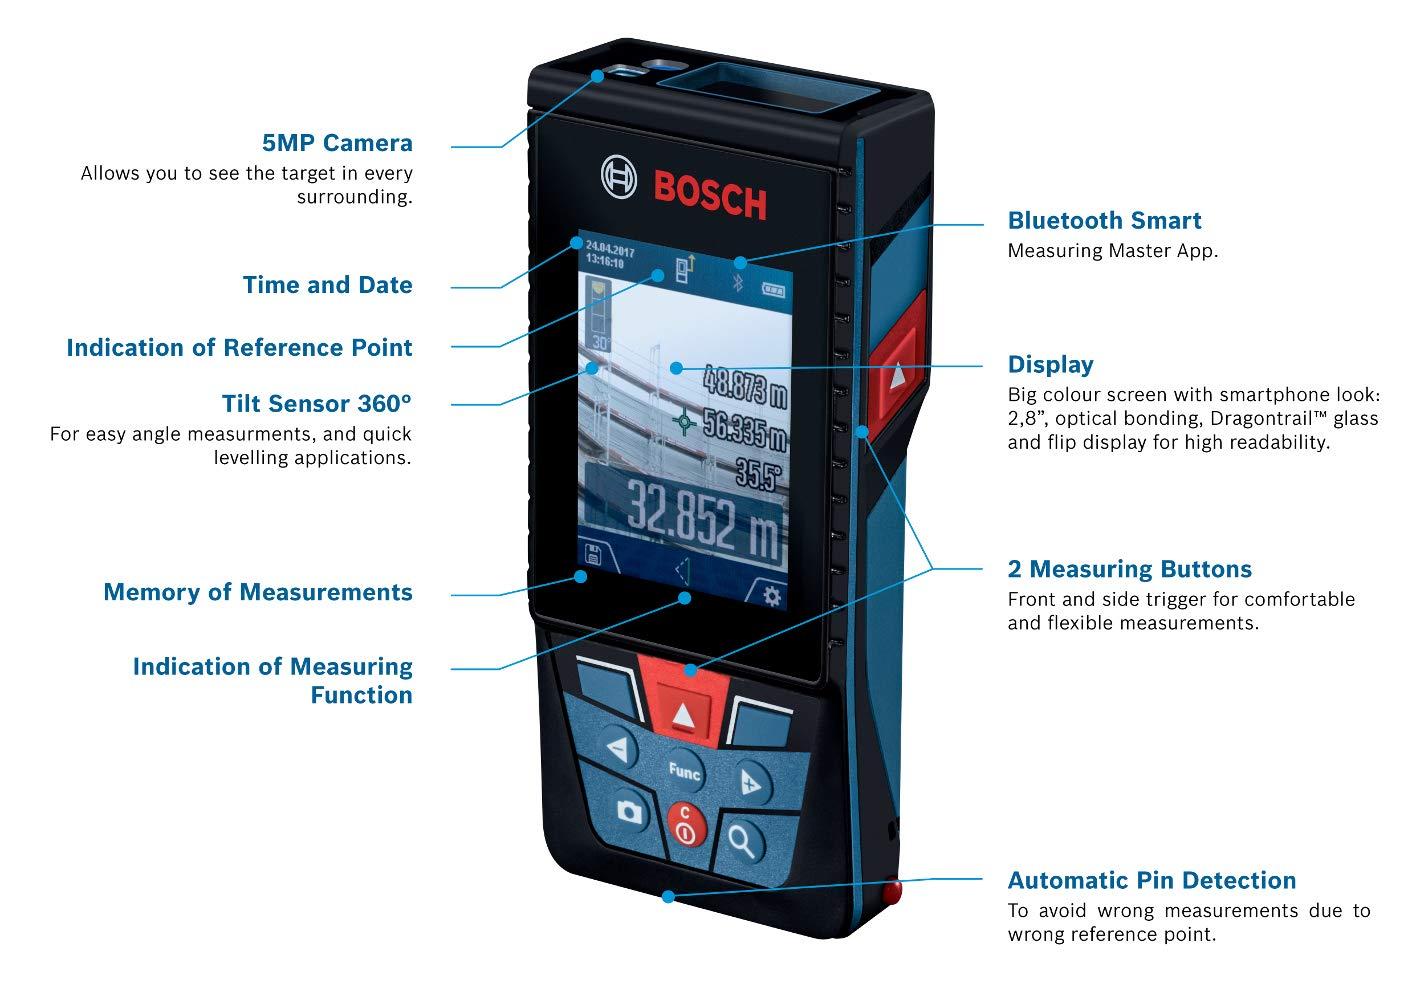 Makita Entfernungsmesser Opinie : Bosch professional laser entfernungsmesser glm 120 c app funktion